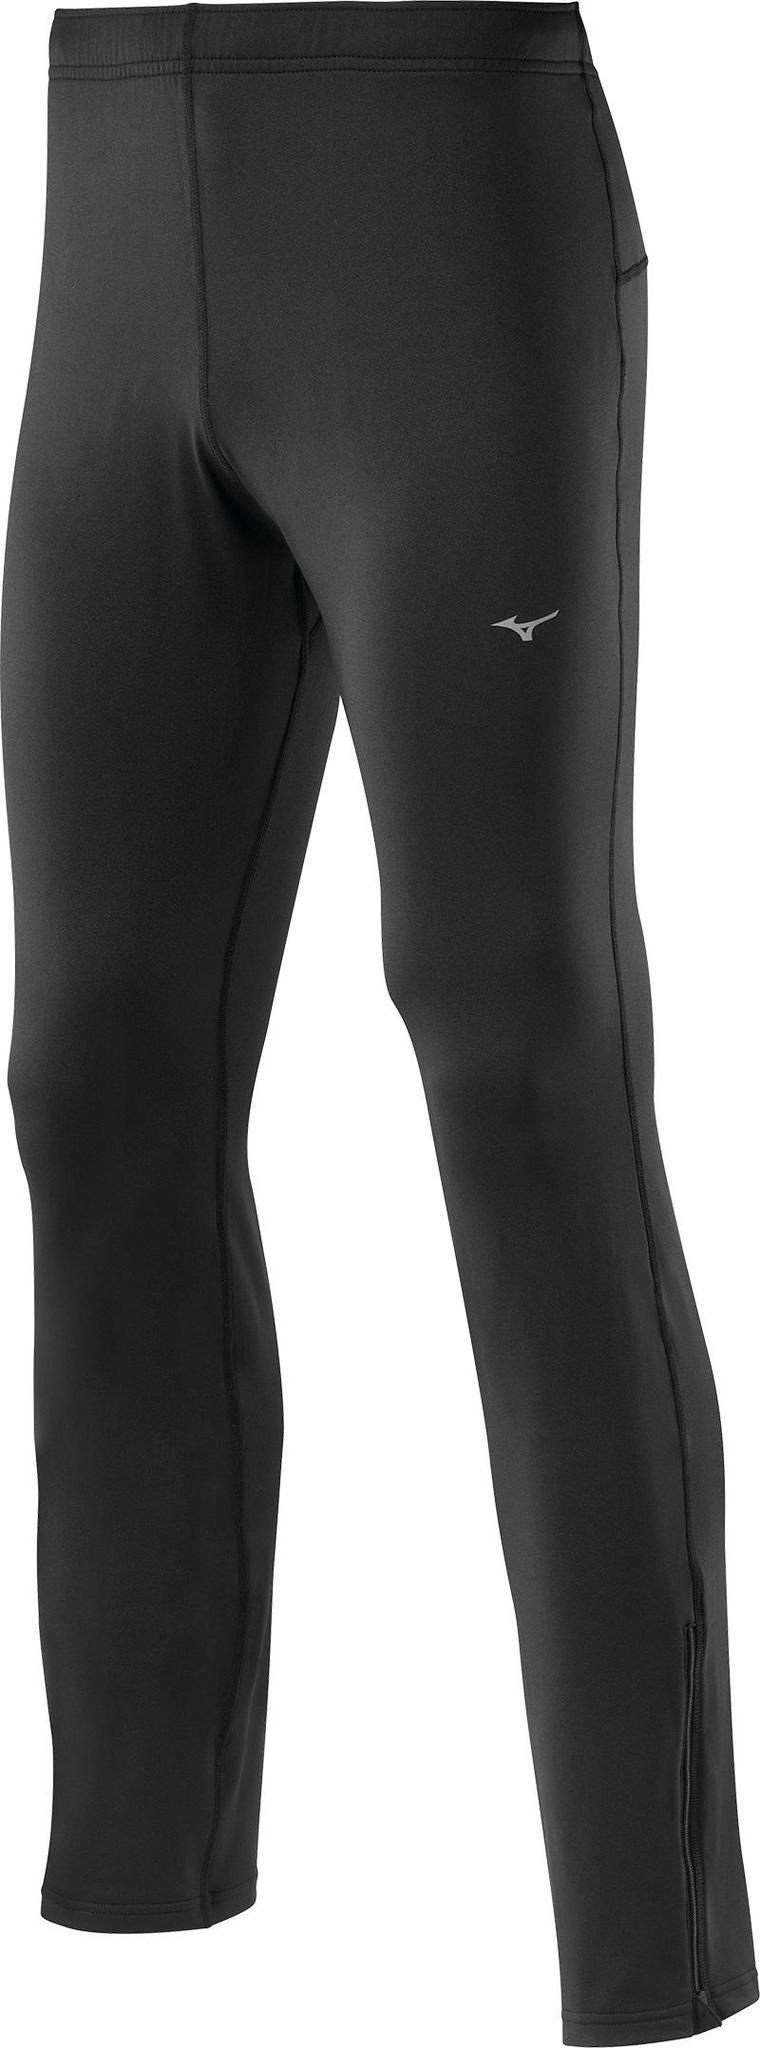 Мужские брюки трекстеры Mizuno Warmalite Long Pants black (J2GD4501 09)